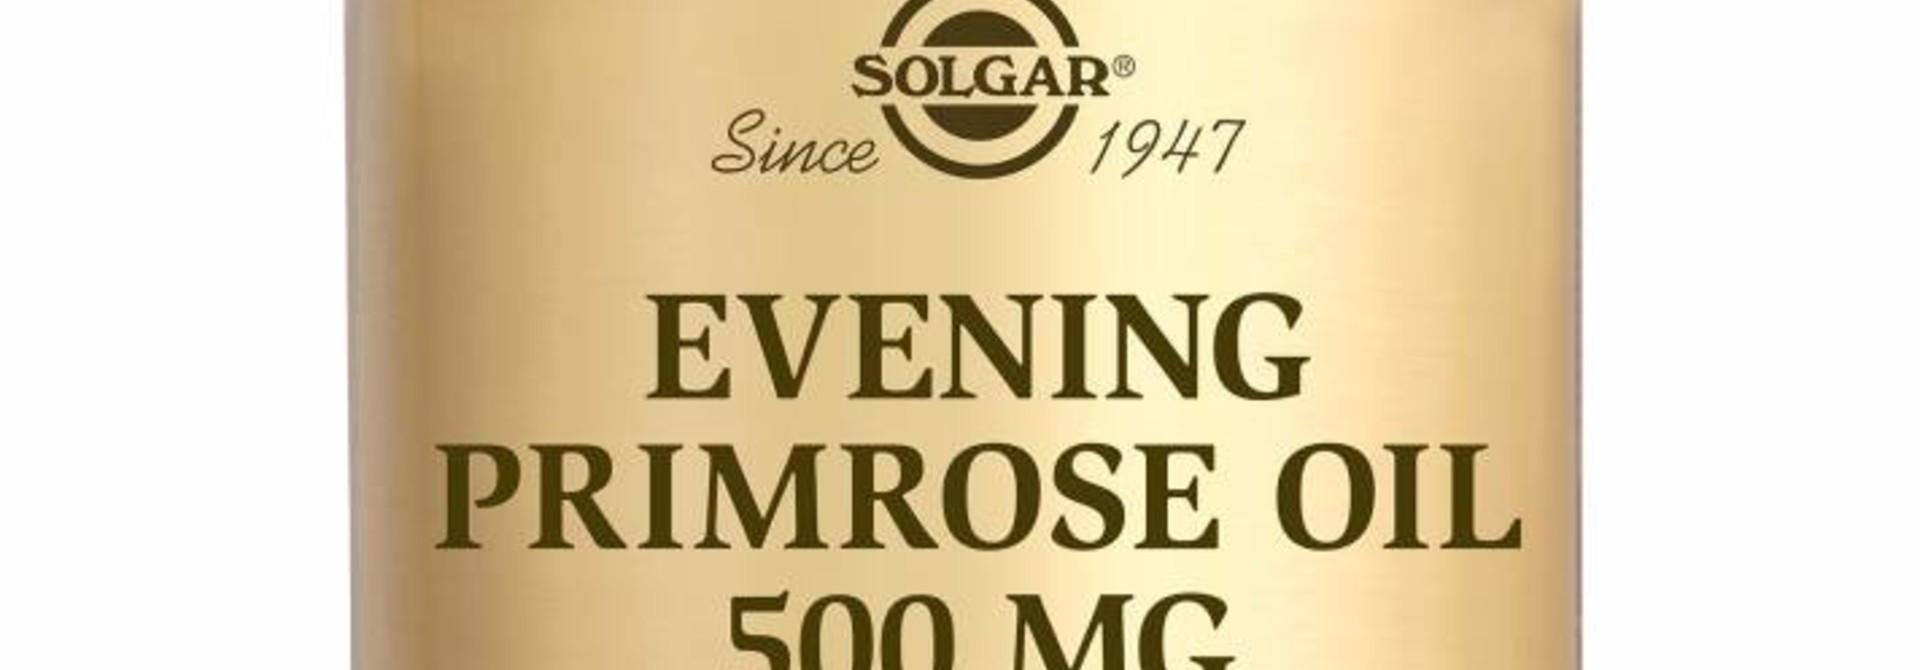 Evening Primrose Oil 500 mg 180 softgels